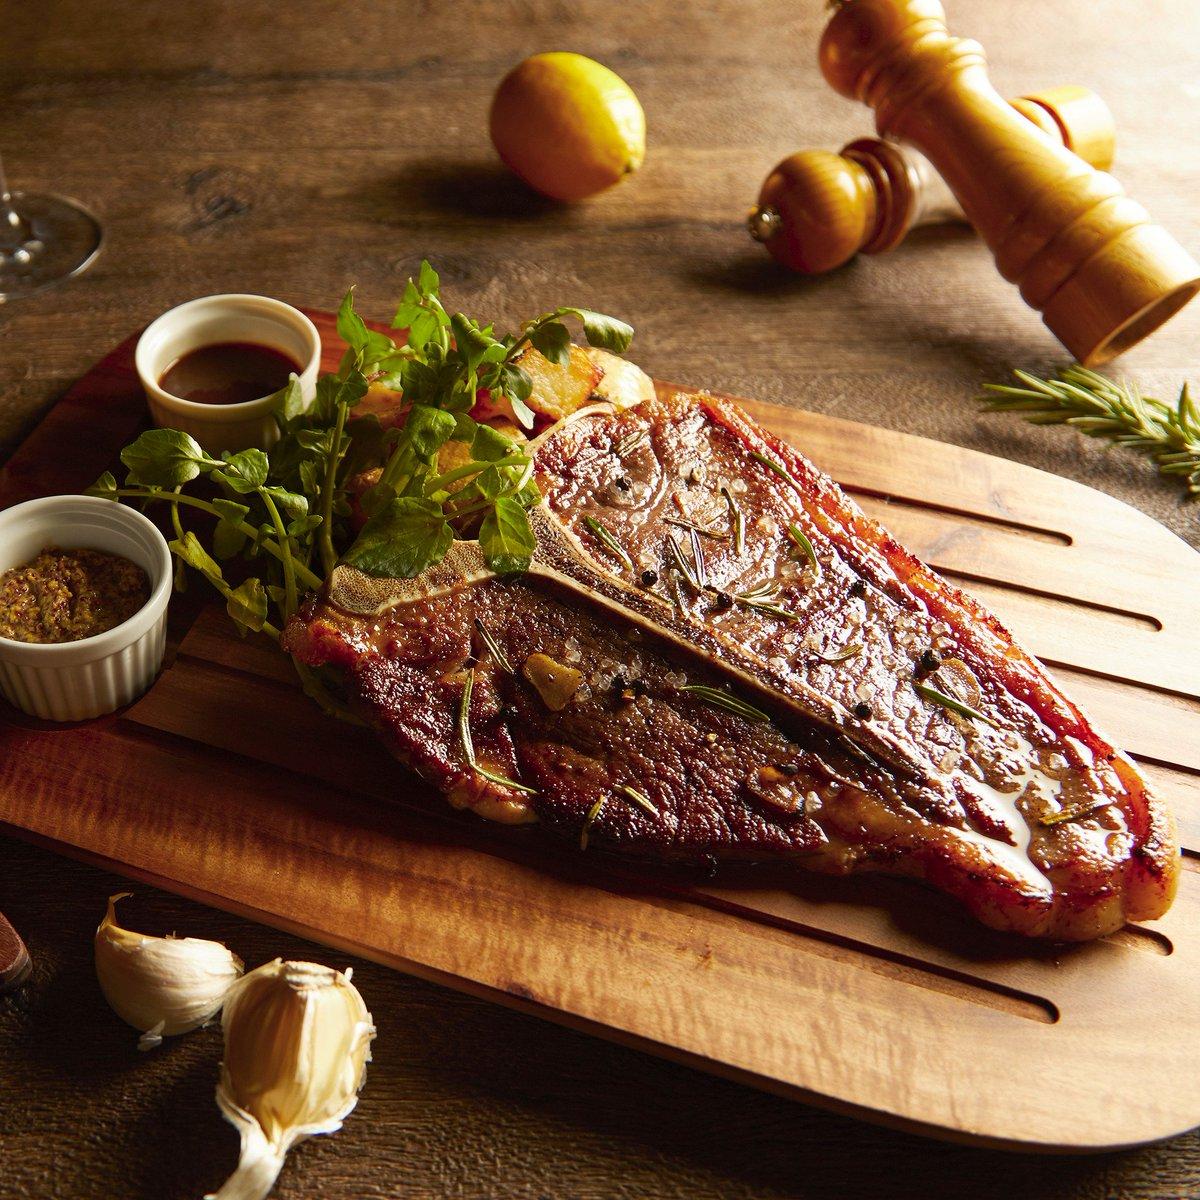 "Dynamic T-bone steak from our Caffè's event ""American Meat Jamboree"" サーロイン、フィレの両方が味わえるダイナミックなTボーンステーキをどうぞ!#hyattregencytokyo #ハイアットリージェンシー東京 https://t.co/eEExBBN1rQ"